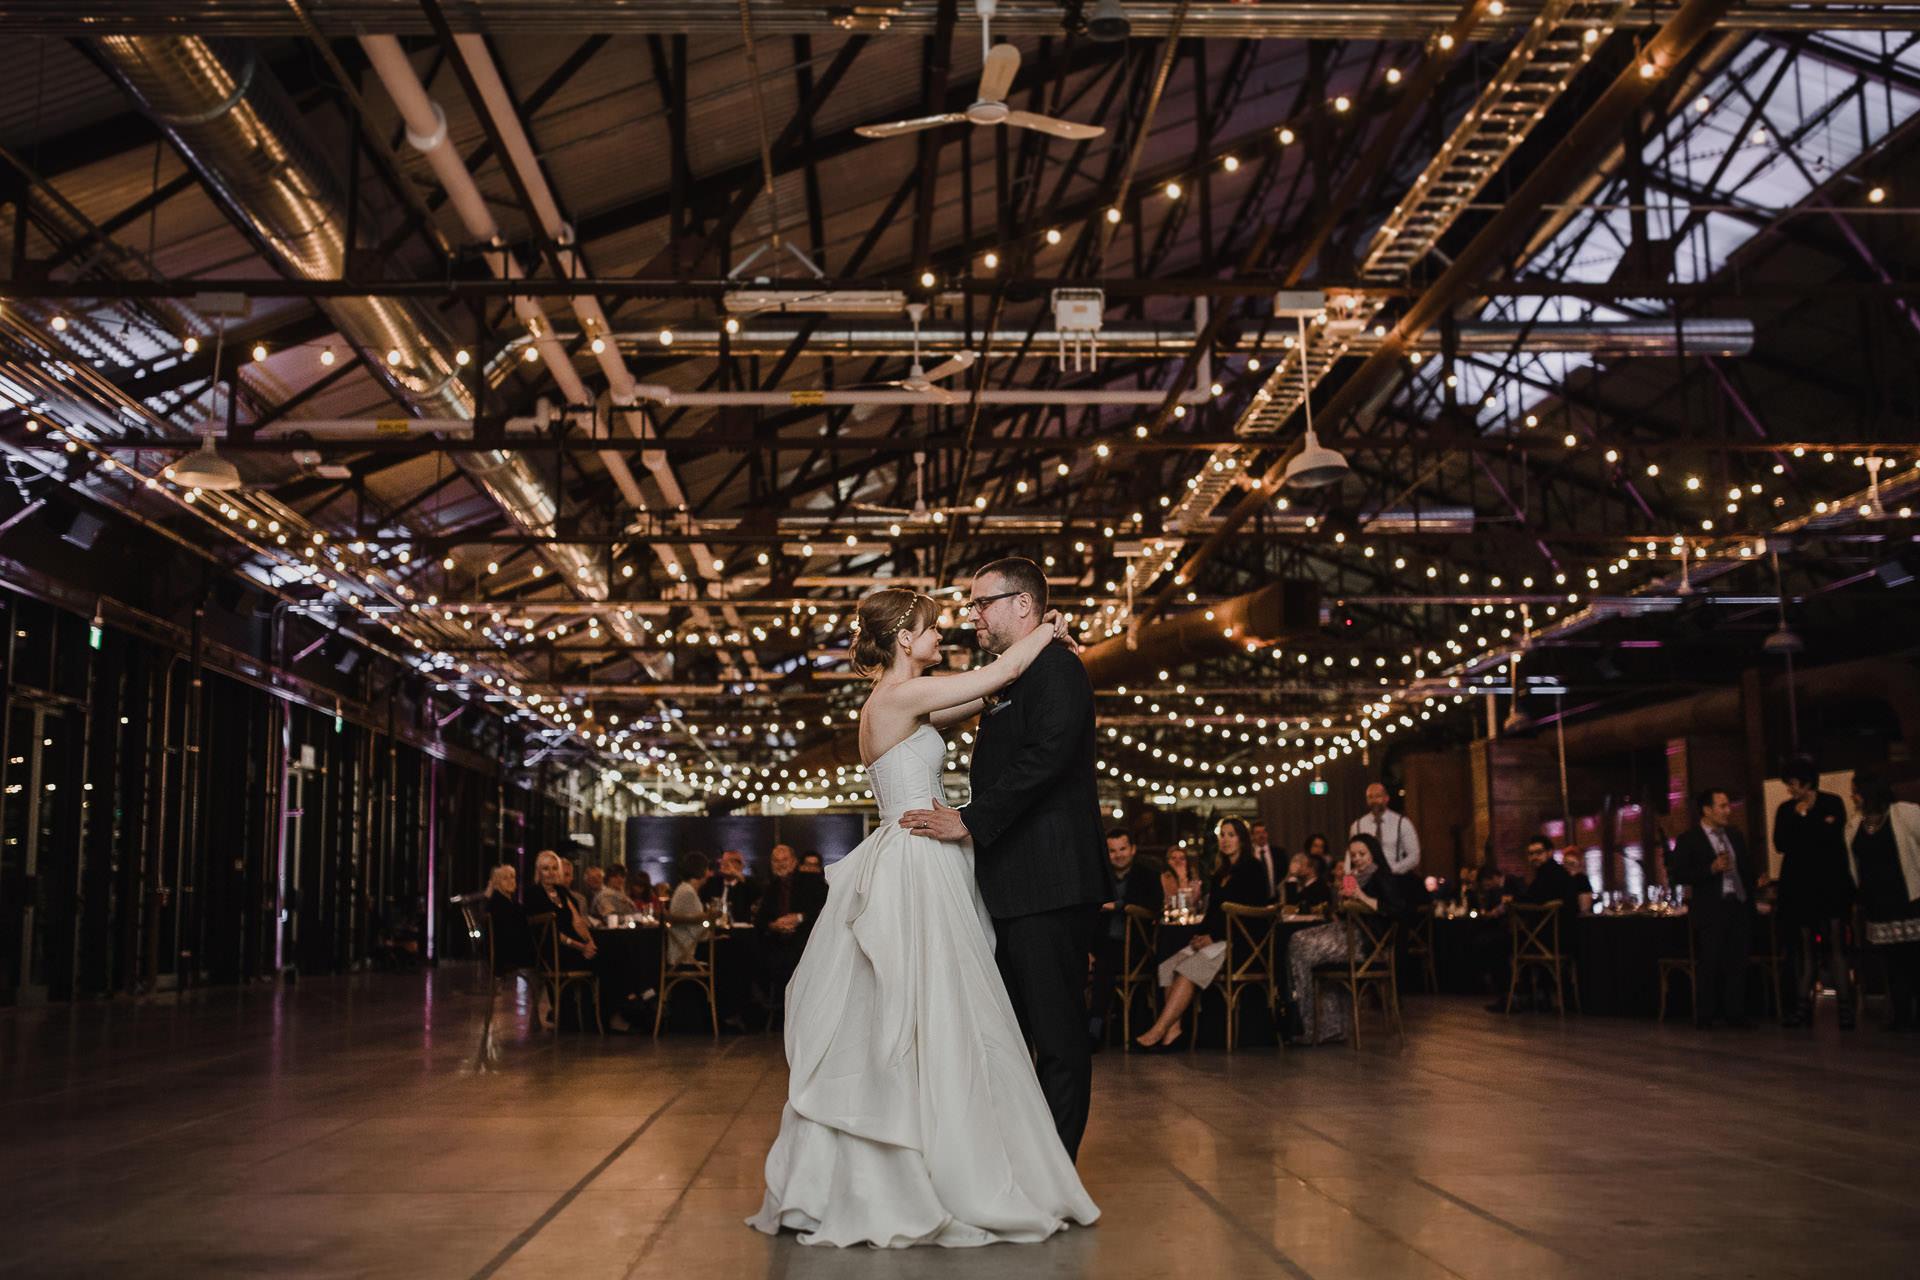 Evergreen Brickworks wedding photographer - first dance